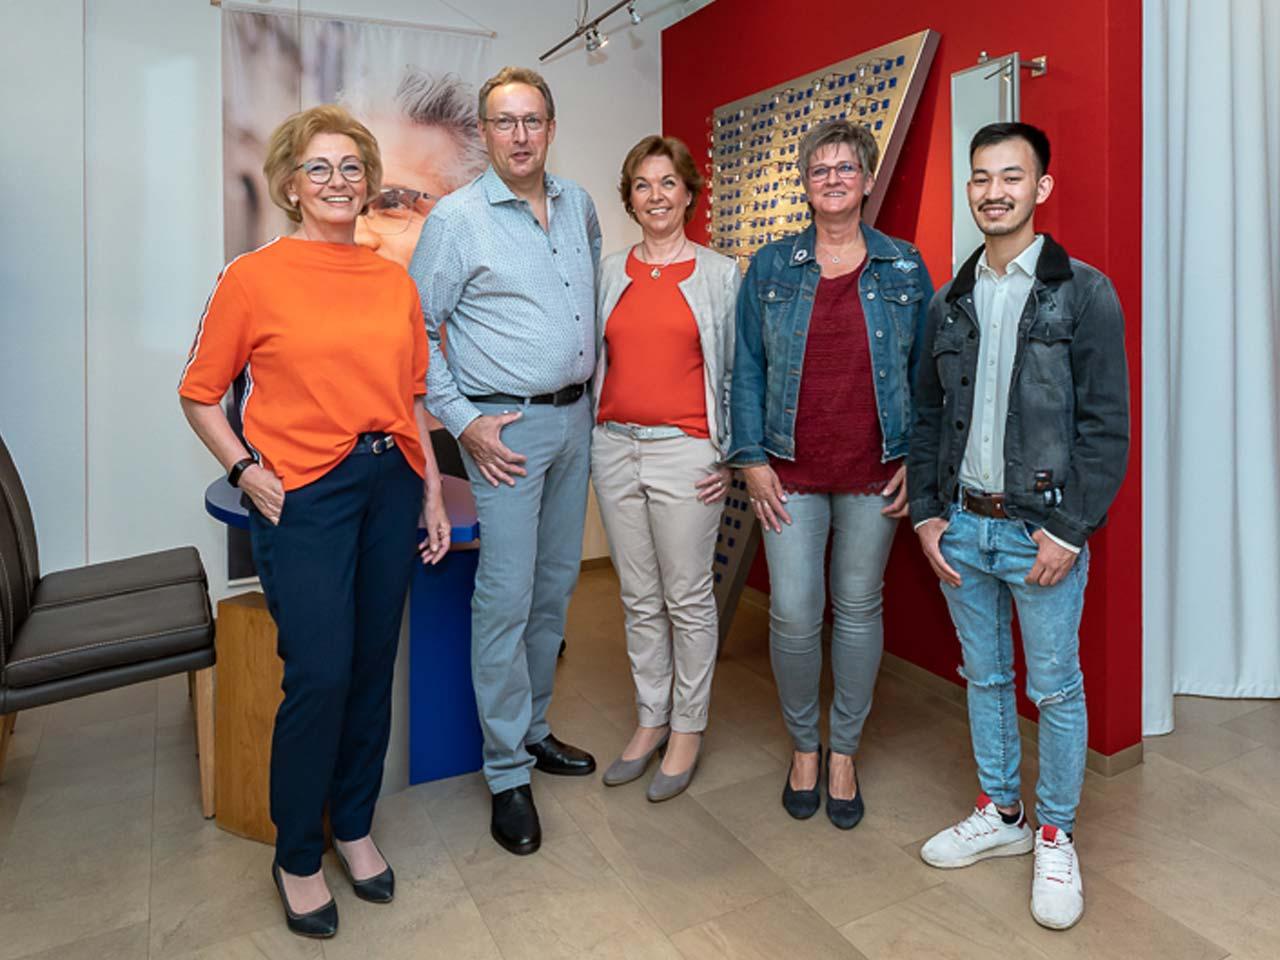 Team - Augenoptik Hillebrand - Hopstener Strasse 8 - 49509 Recke